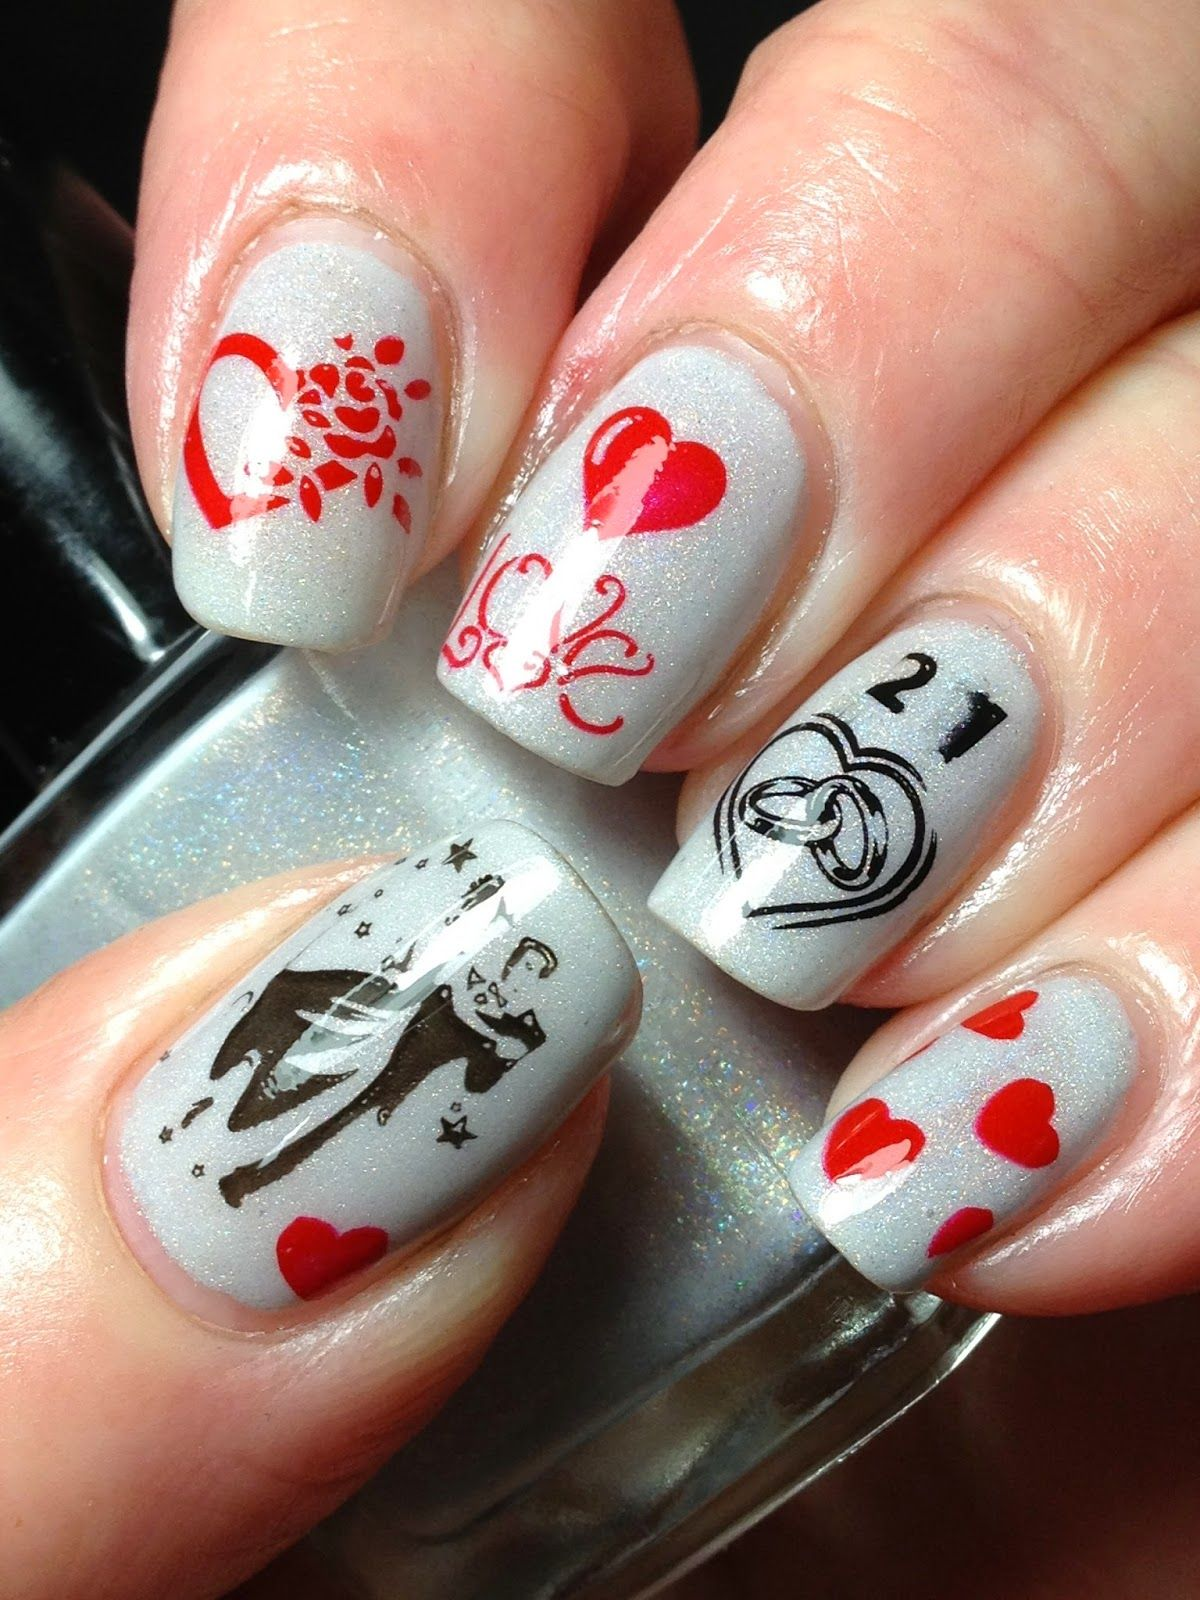 Canadian Nail Fanatic Anniversary Nails And Giveaway Reminders